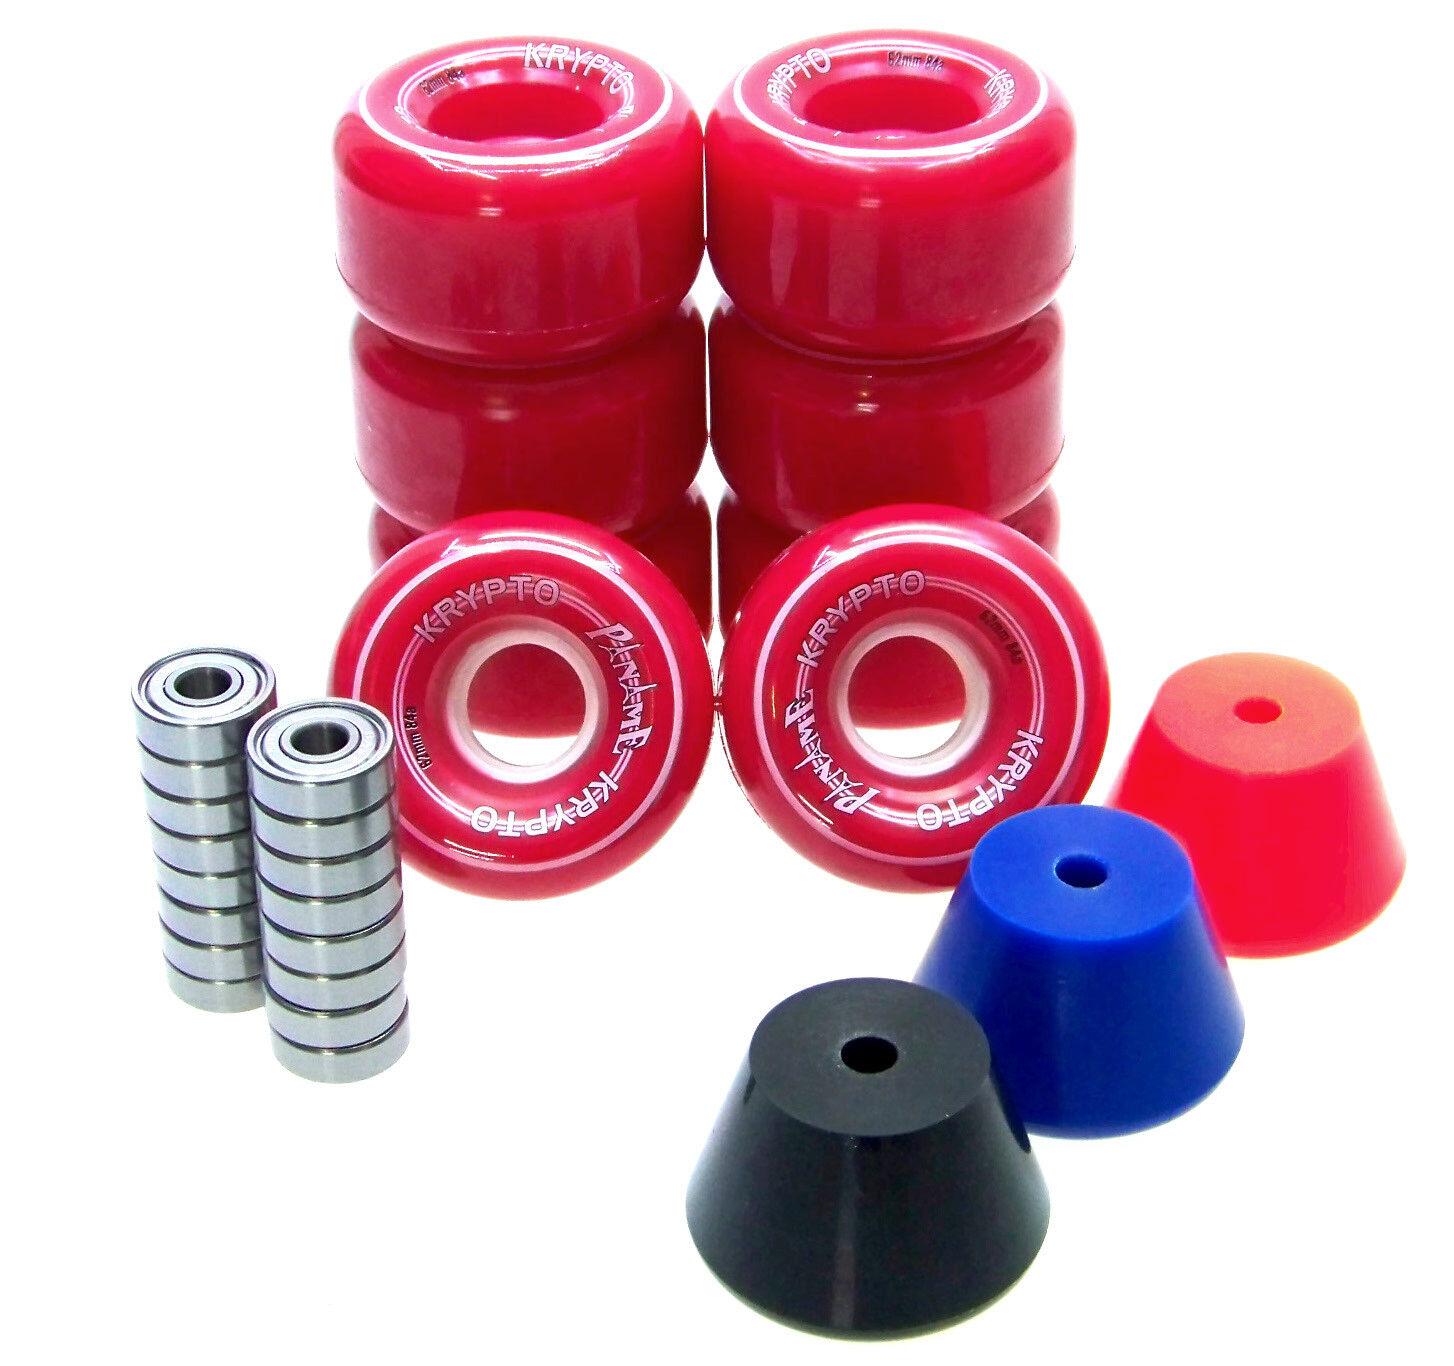 Rollschuh Rollen / Stopper / ABEC Lager Set  Disco Roller Skate PANAME ROT